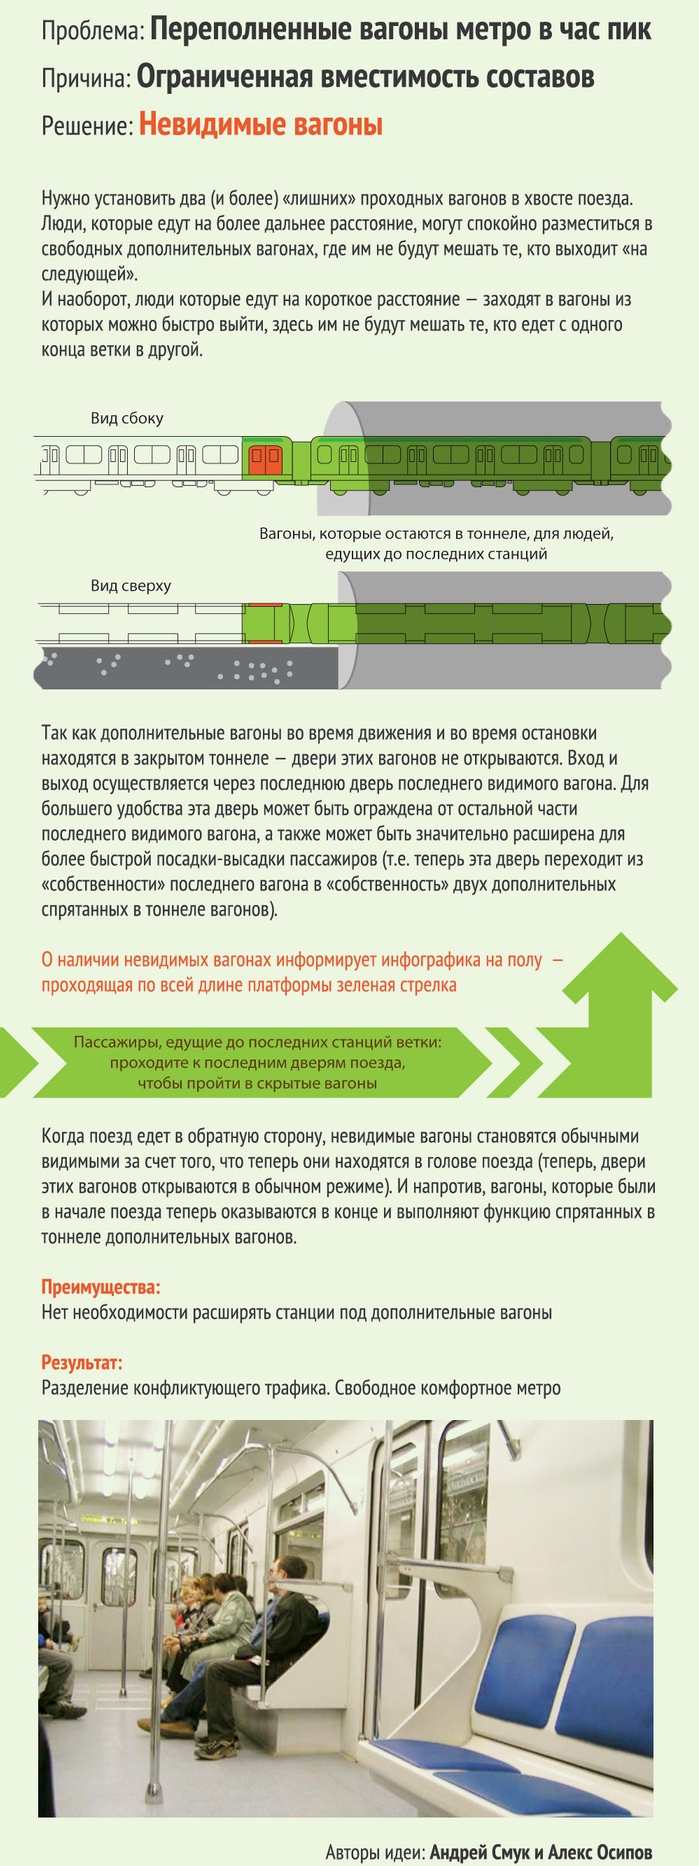 kak_razgruzit_moskovskoe_metro_2